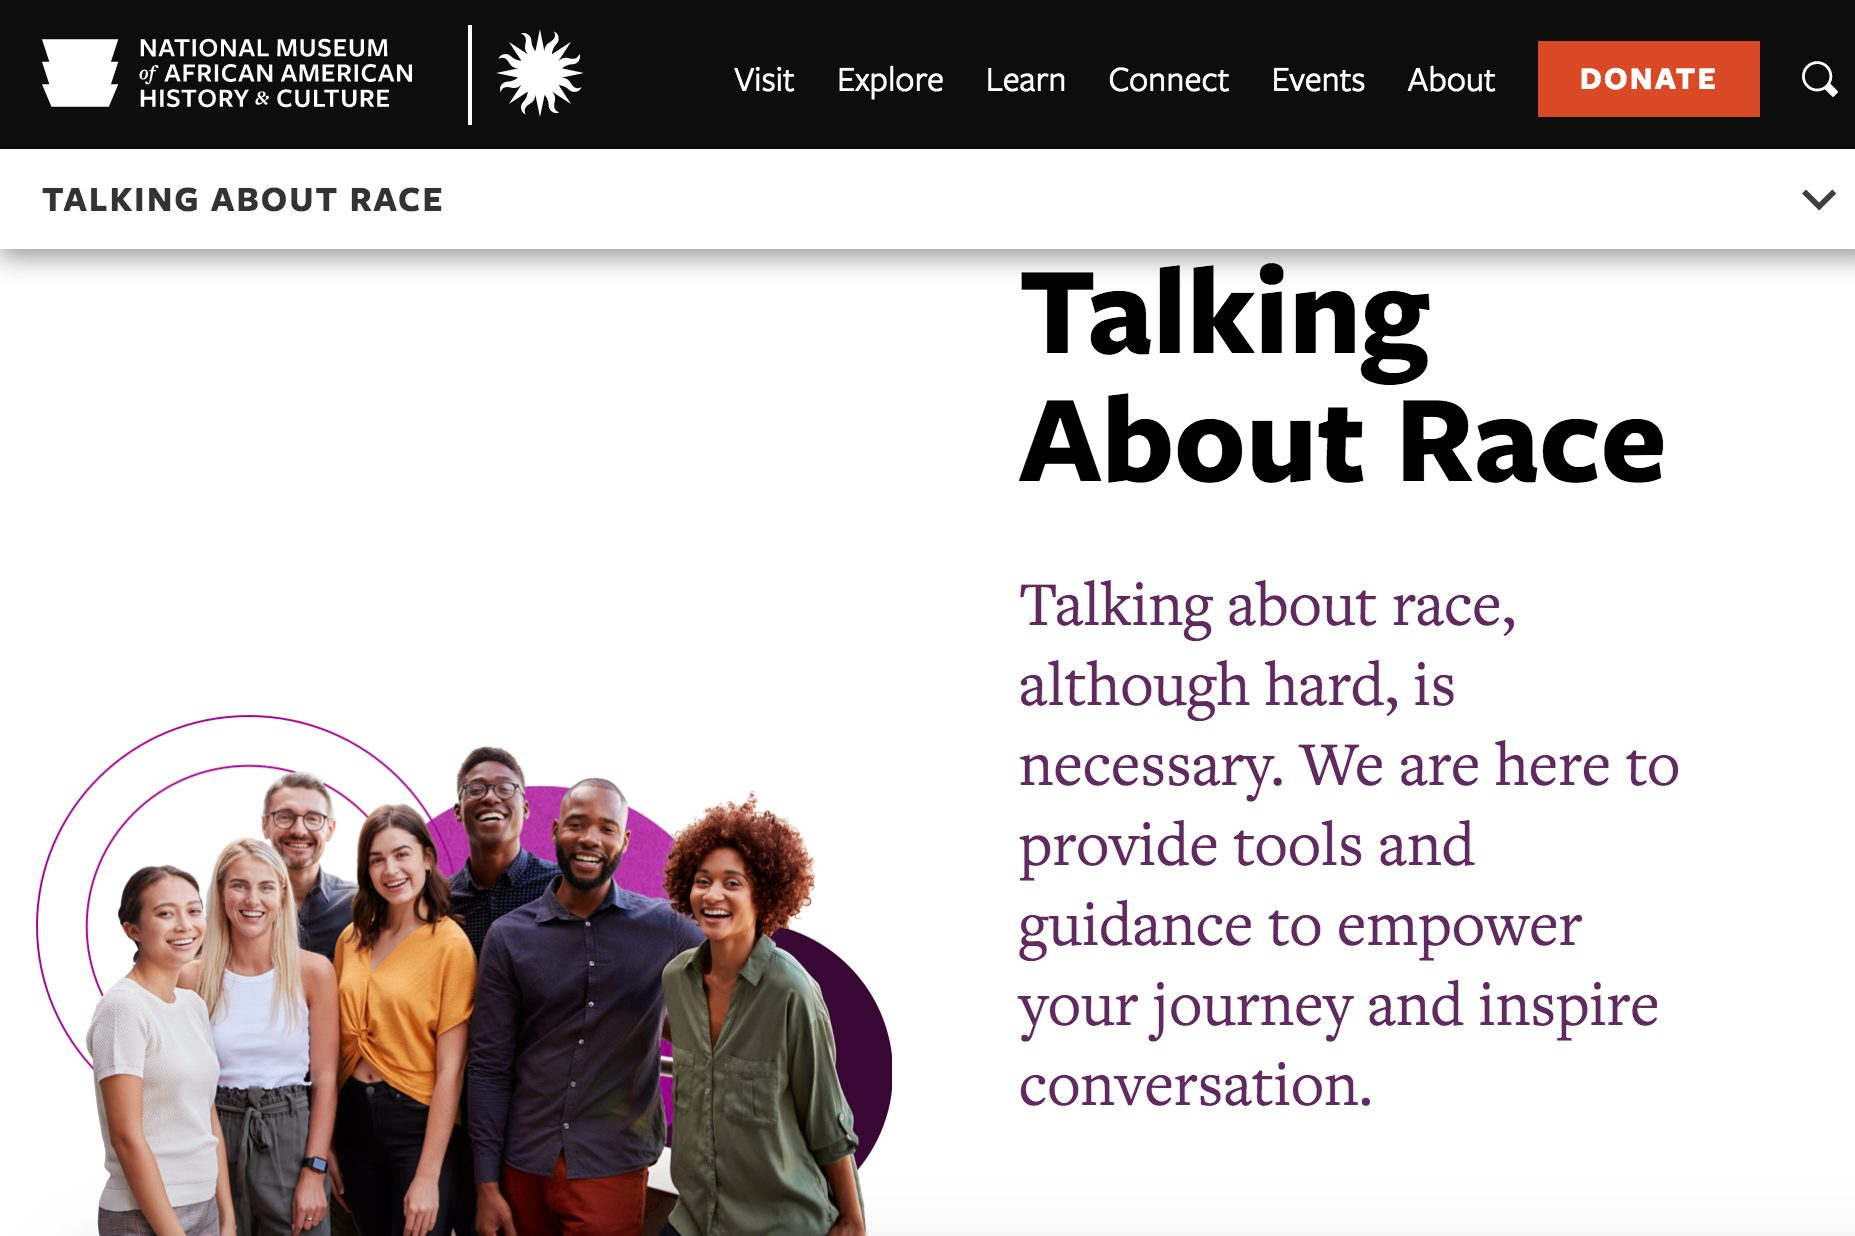 smithsonian talking about race